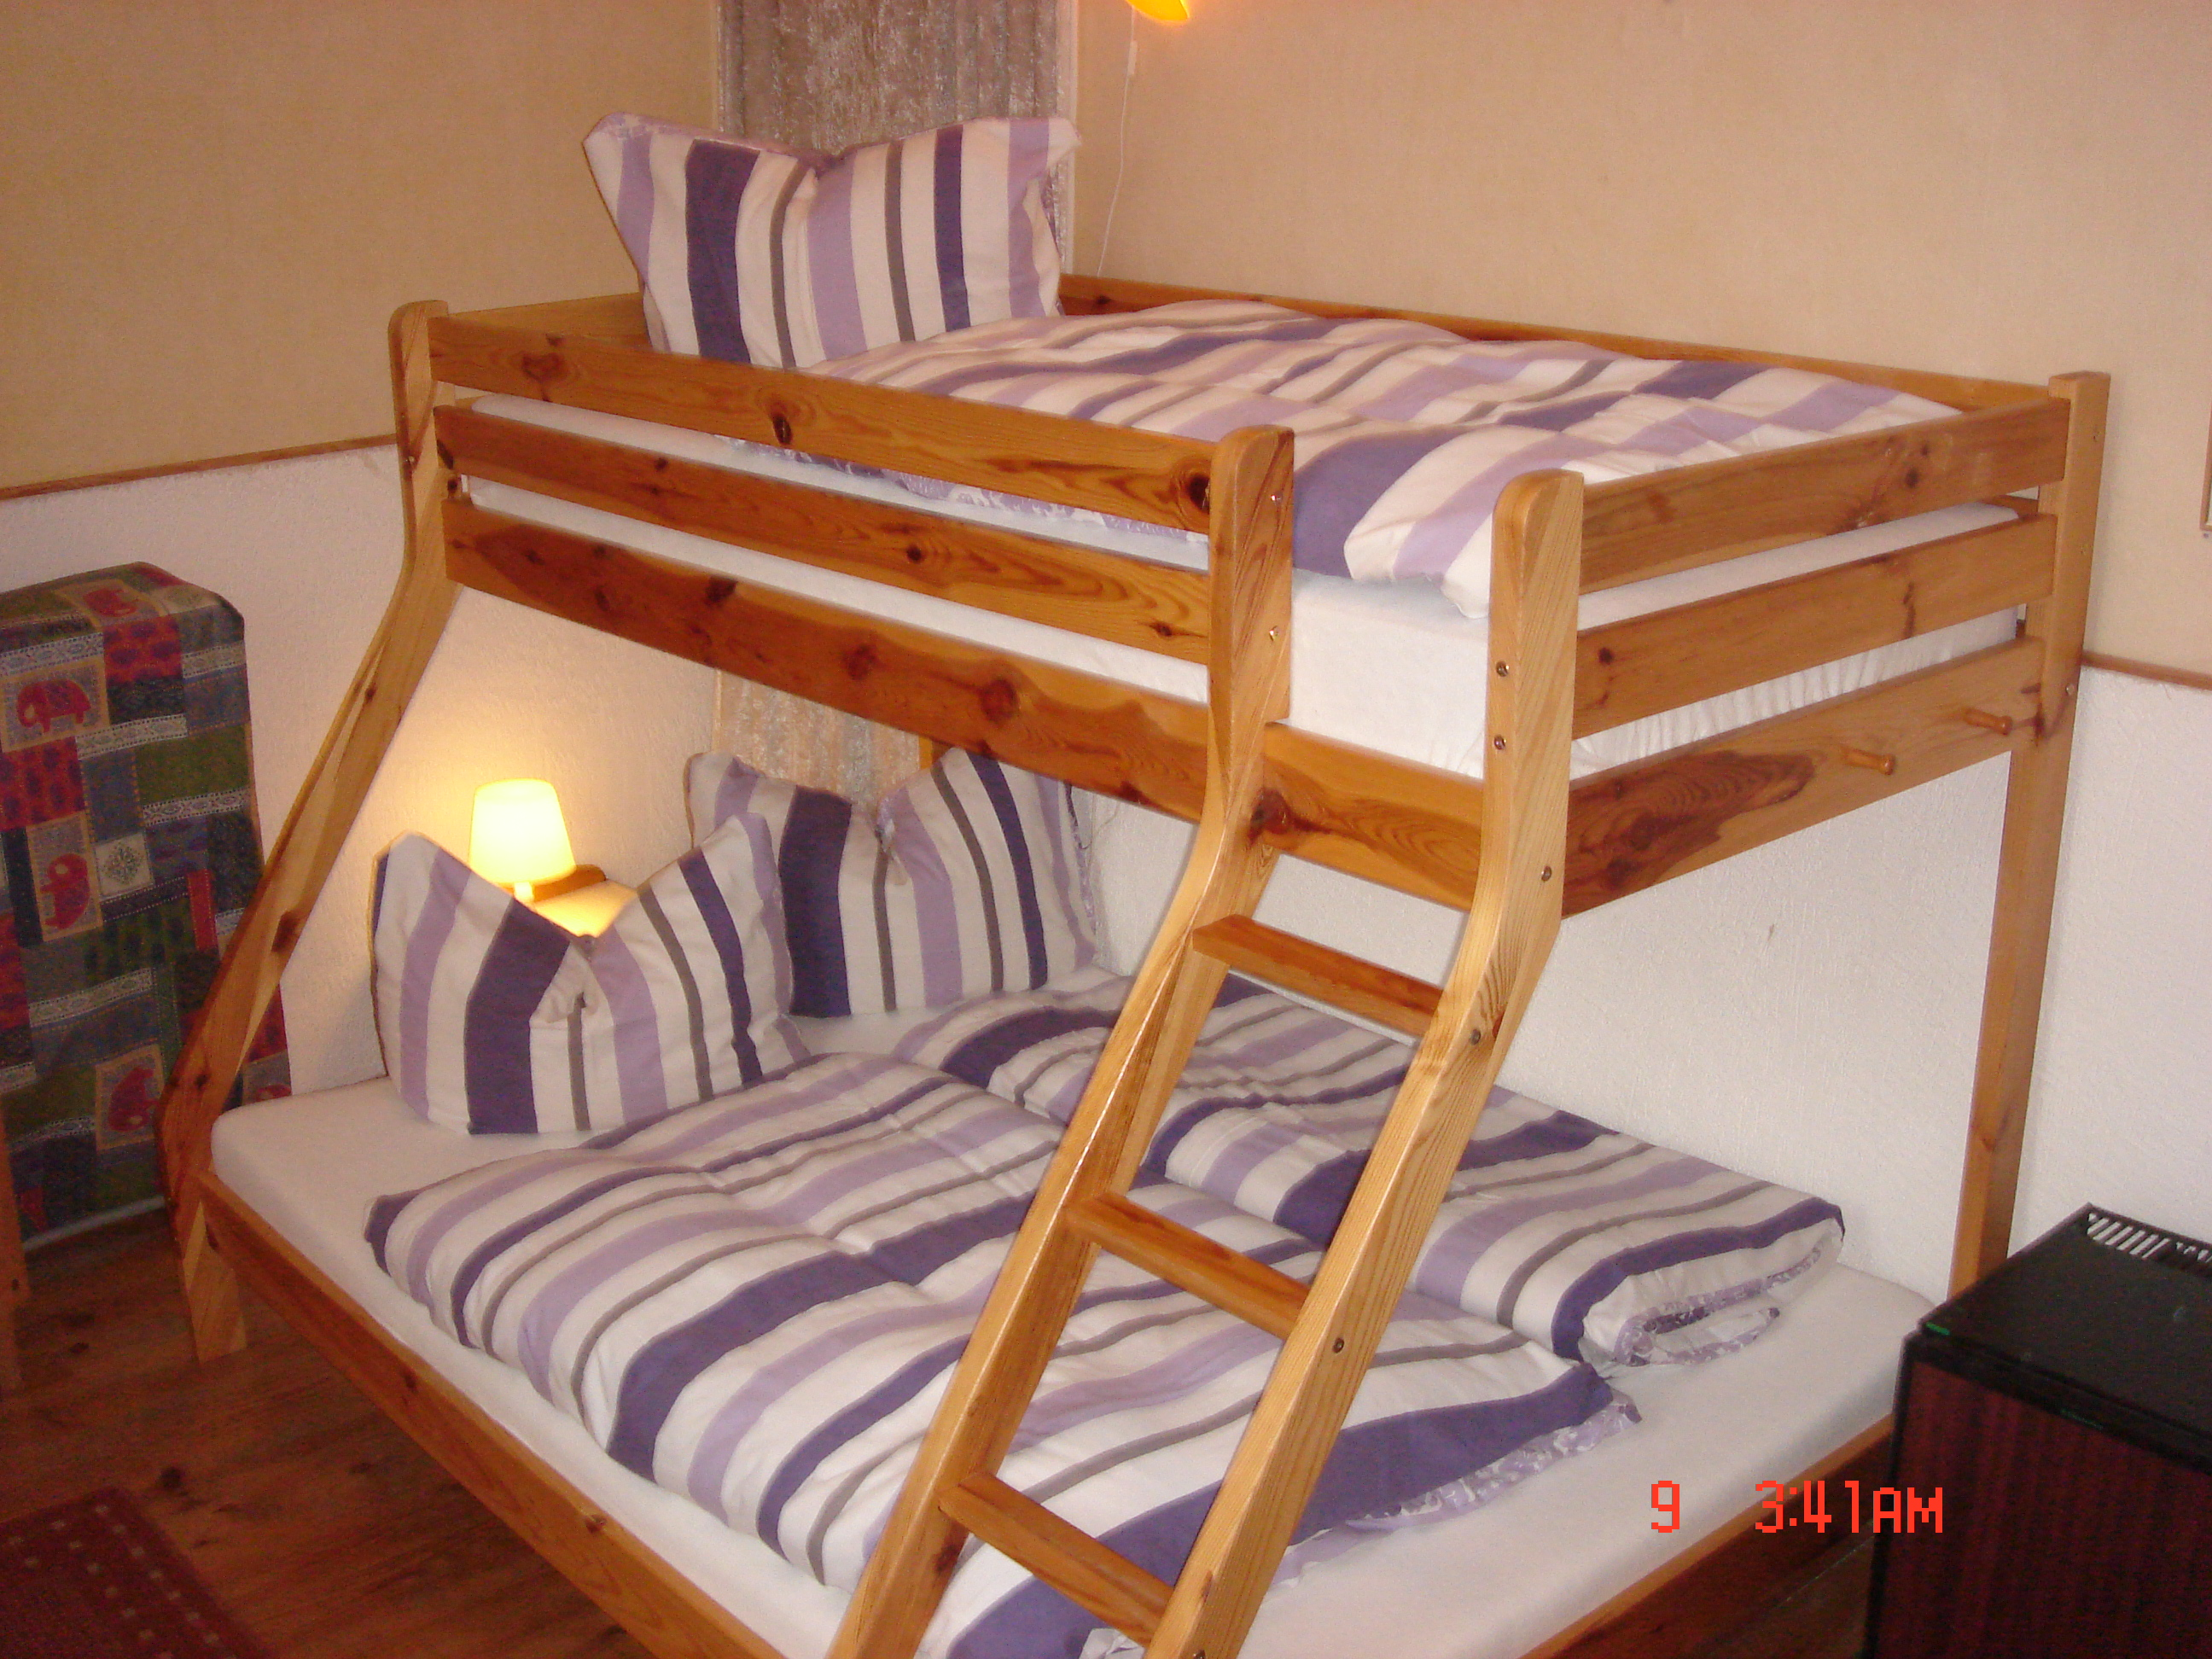 fremdenzimmer pension schwermer bilder. Black Bedroom Furniture Sets. Home Design Ideas